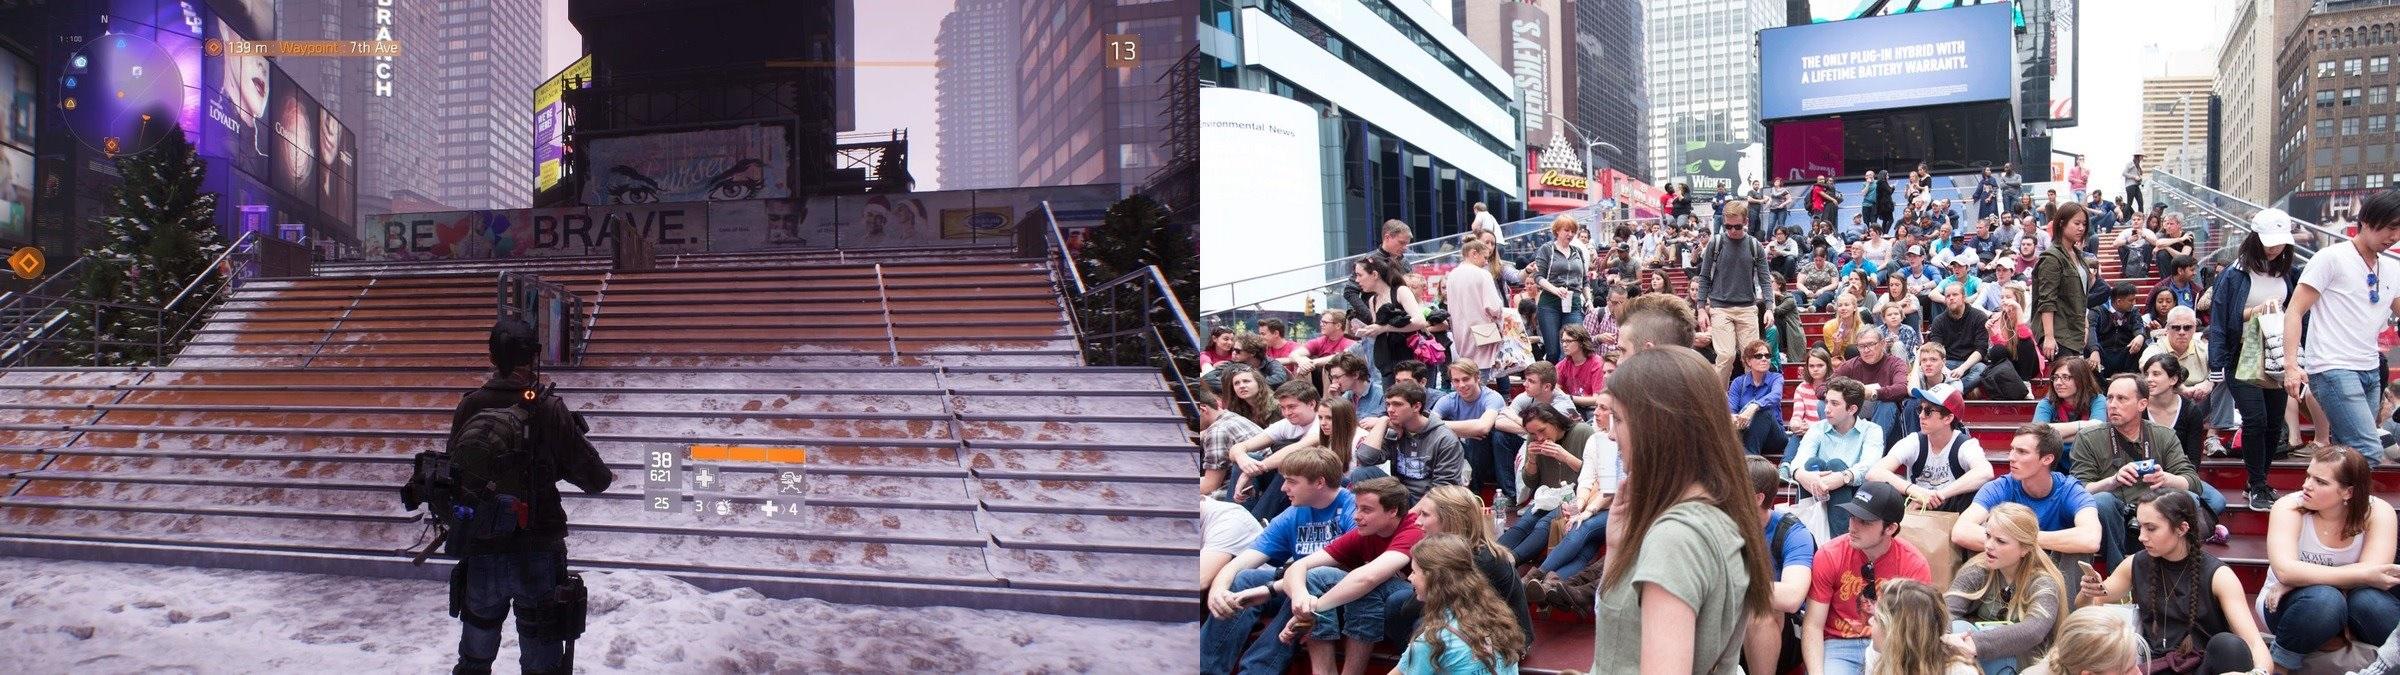 Times Square teliko 2